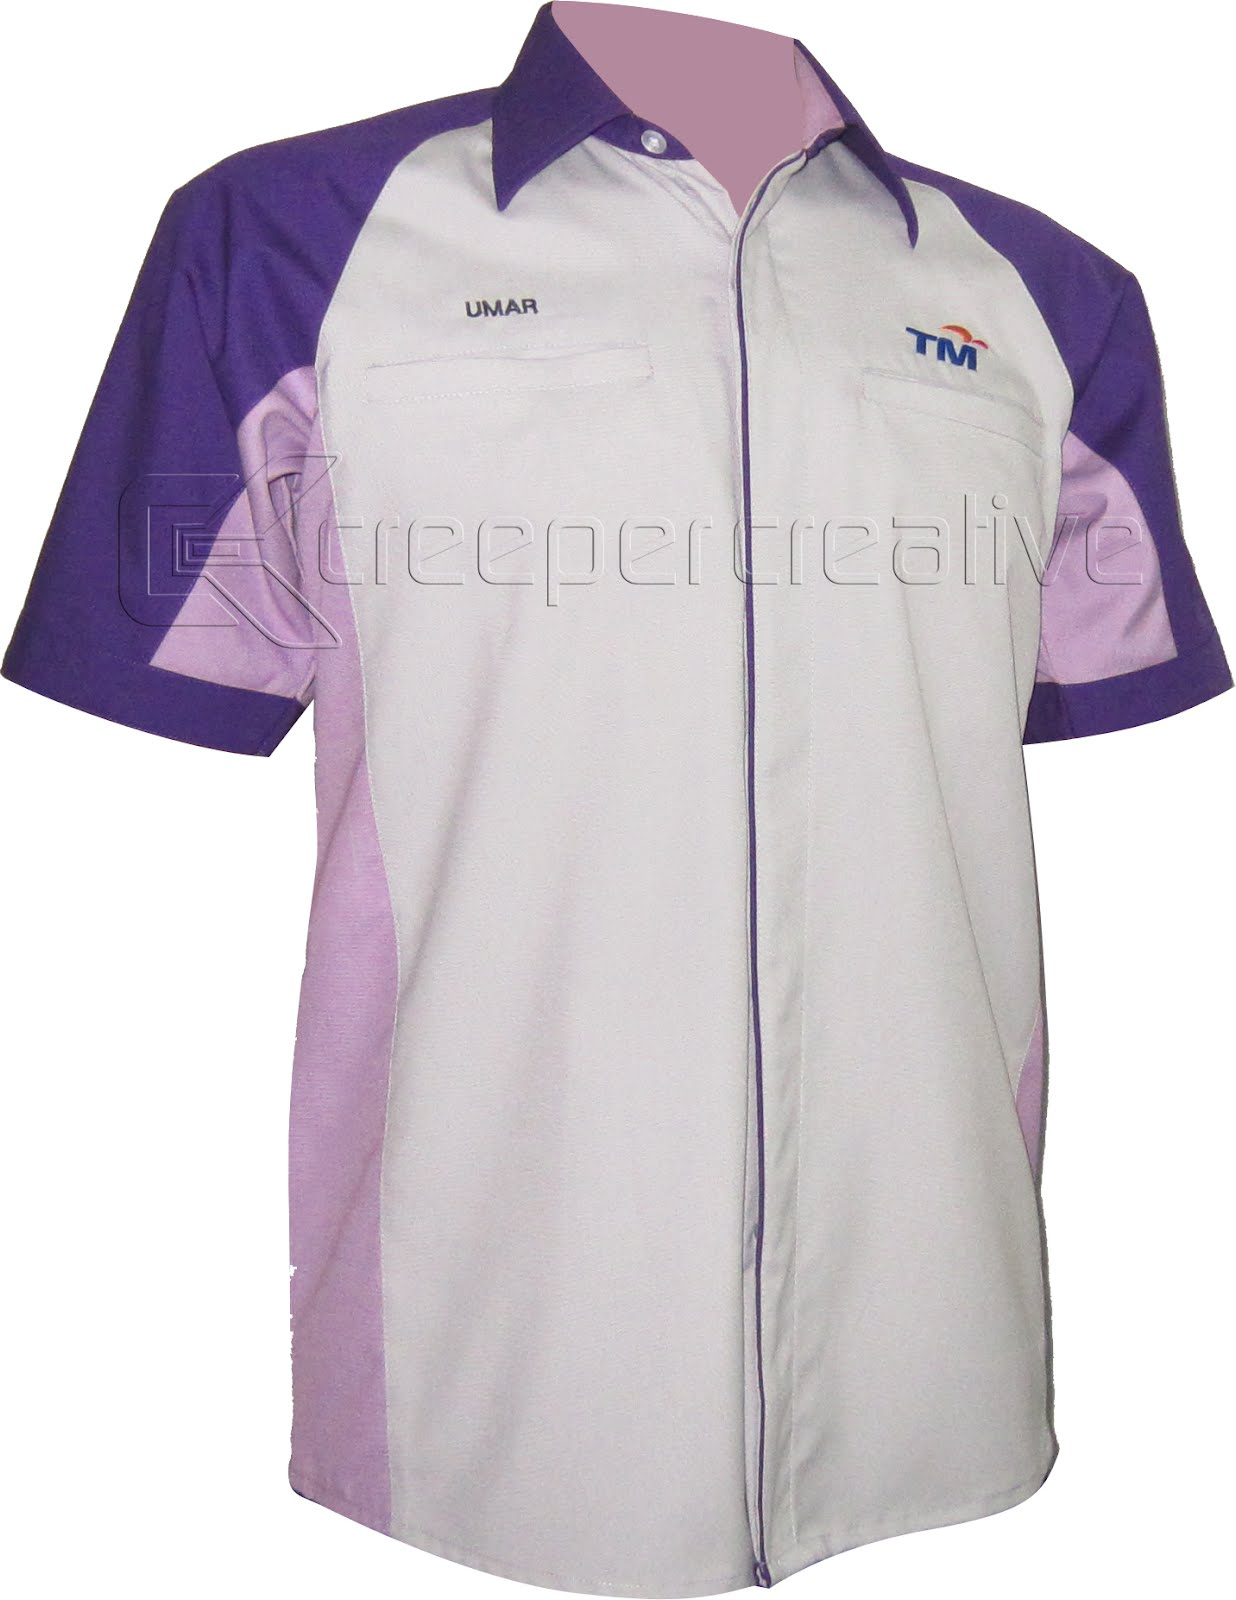 Shirt design malaysia -  Baju F1 Baju Korporat F1 Uniform Corporate Uniform Uniform F1 Shirt Lady S Cutting F1 Shirt Design Kemeja F1 Terkini Corporate Shirt Design